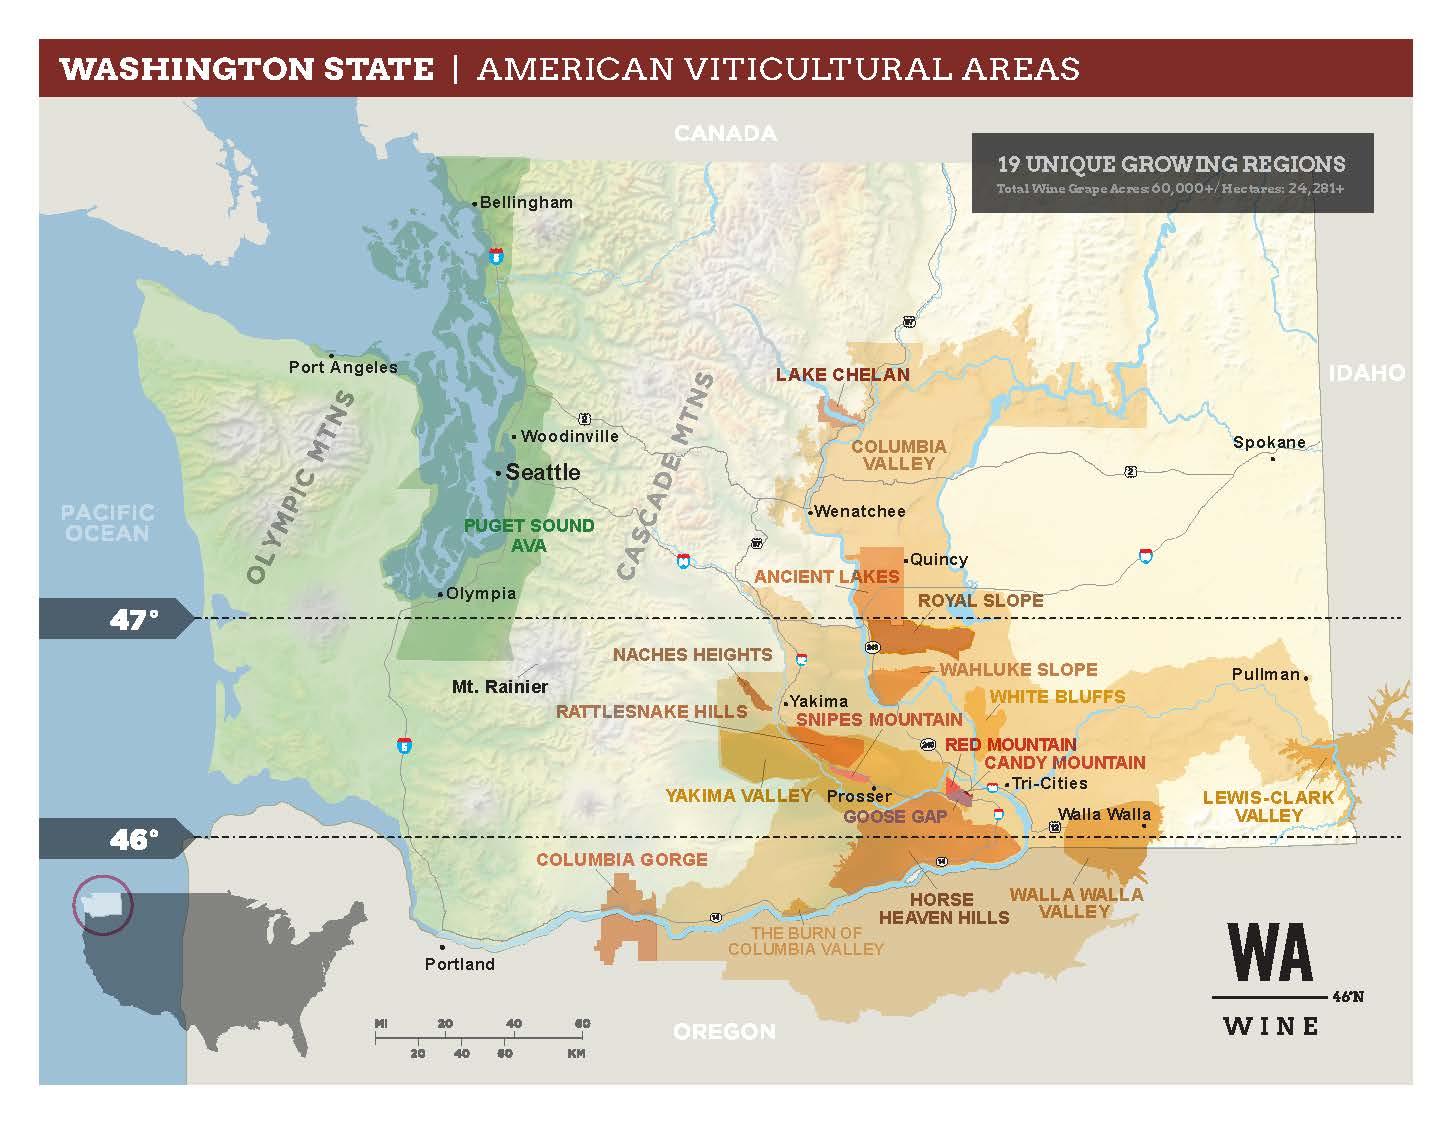 Map of Washington State showing its AVAs.